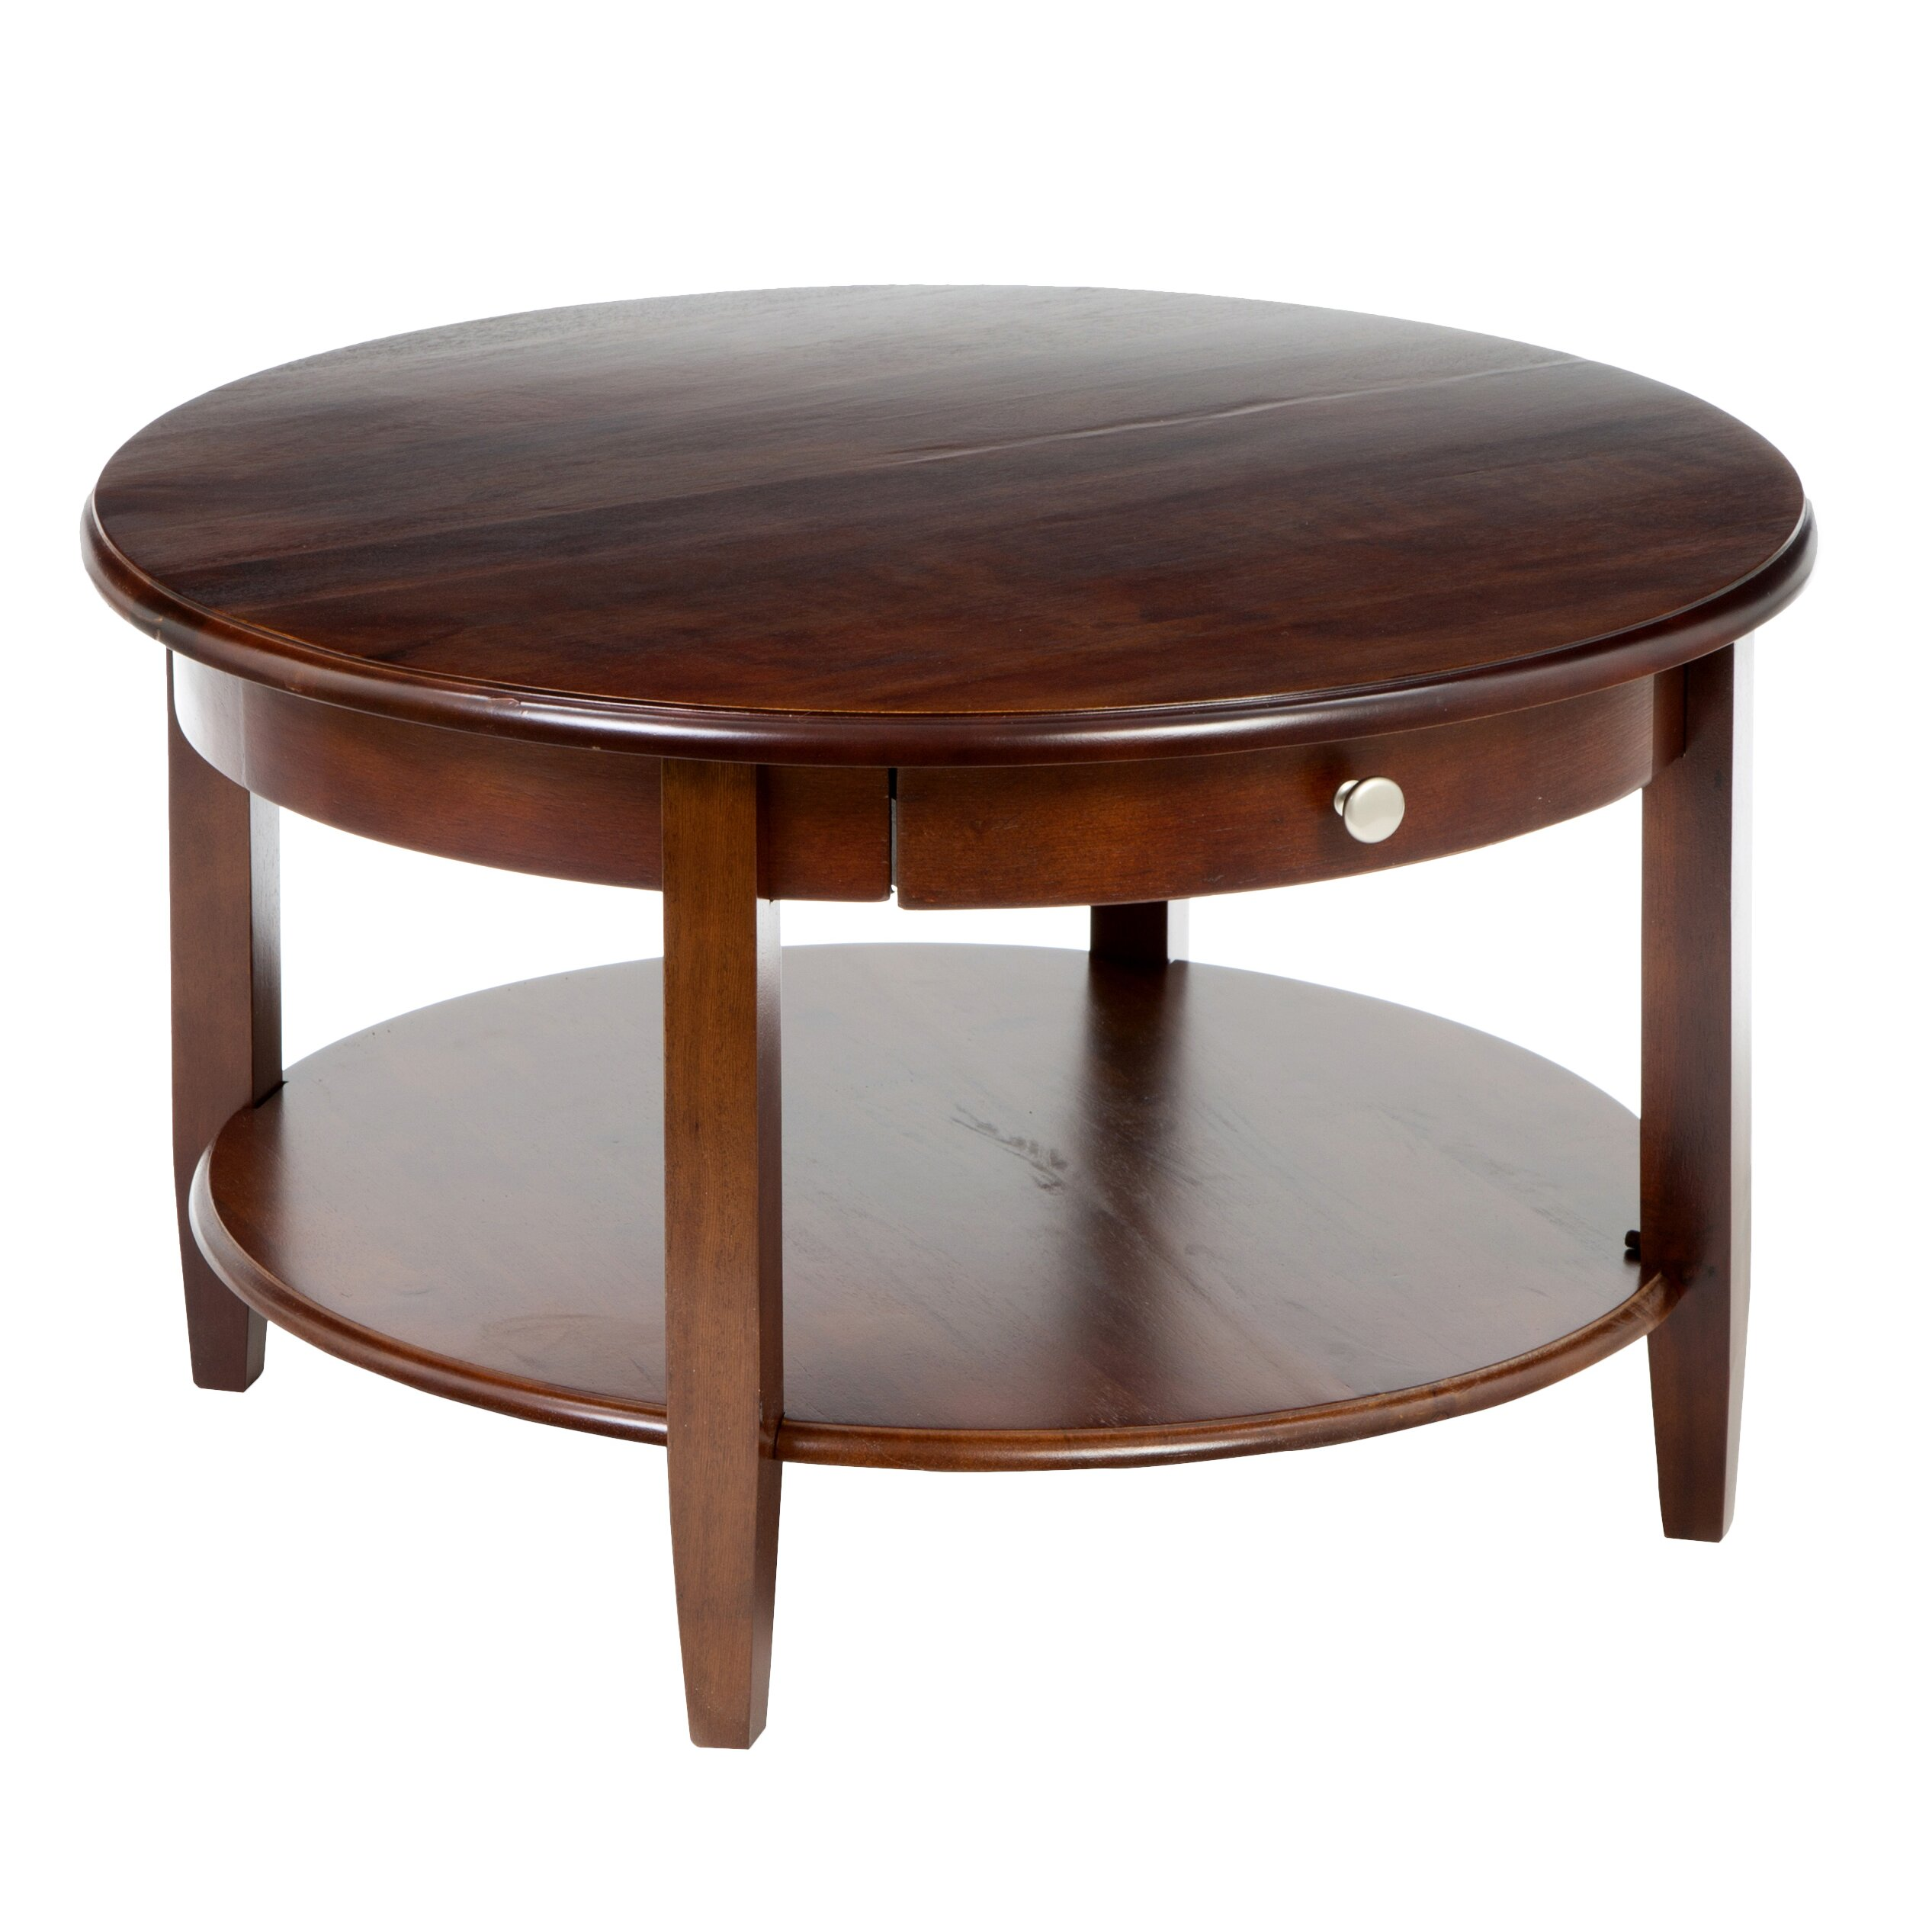 Wayfair Table: Charlton Home Braeswood Coffee Table & Reviews